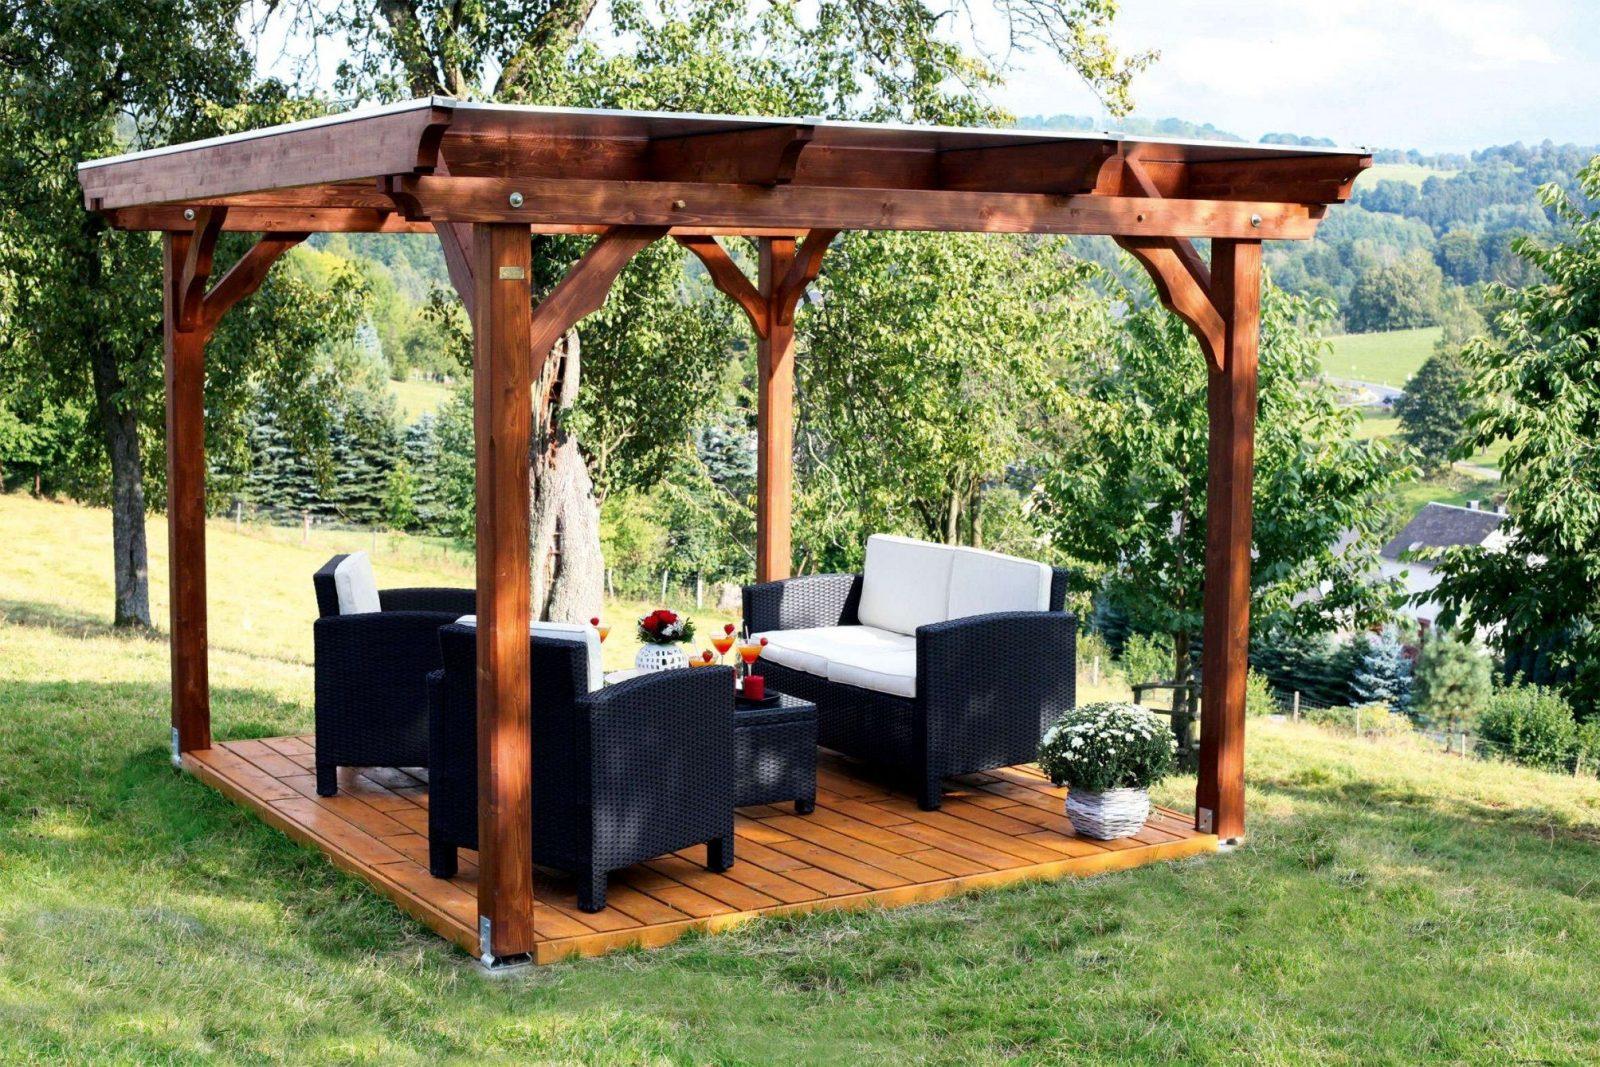 pavillon balkon selber bauen pavillons online kaufen in 3x3 3x4 3x6 4x4 rund otto. Black Bedroom Furniture Sets. Home Design Ideas